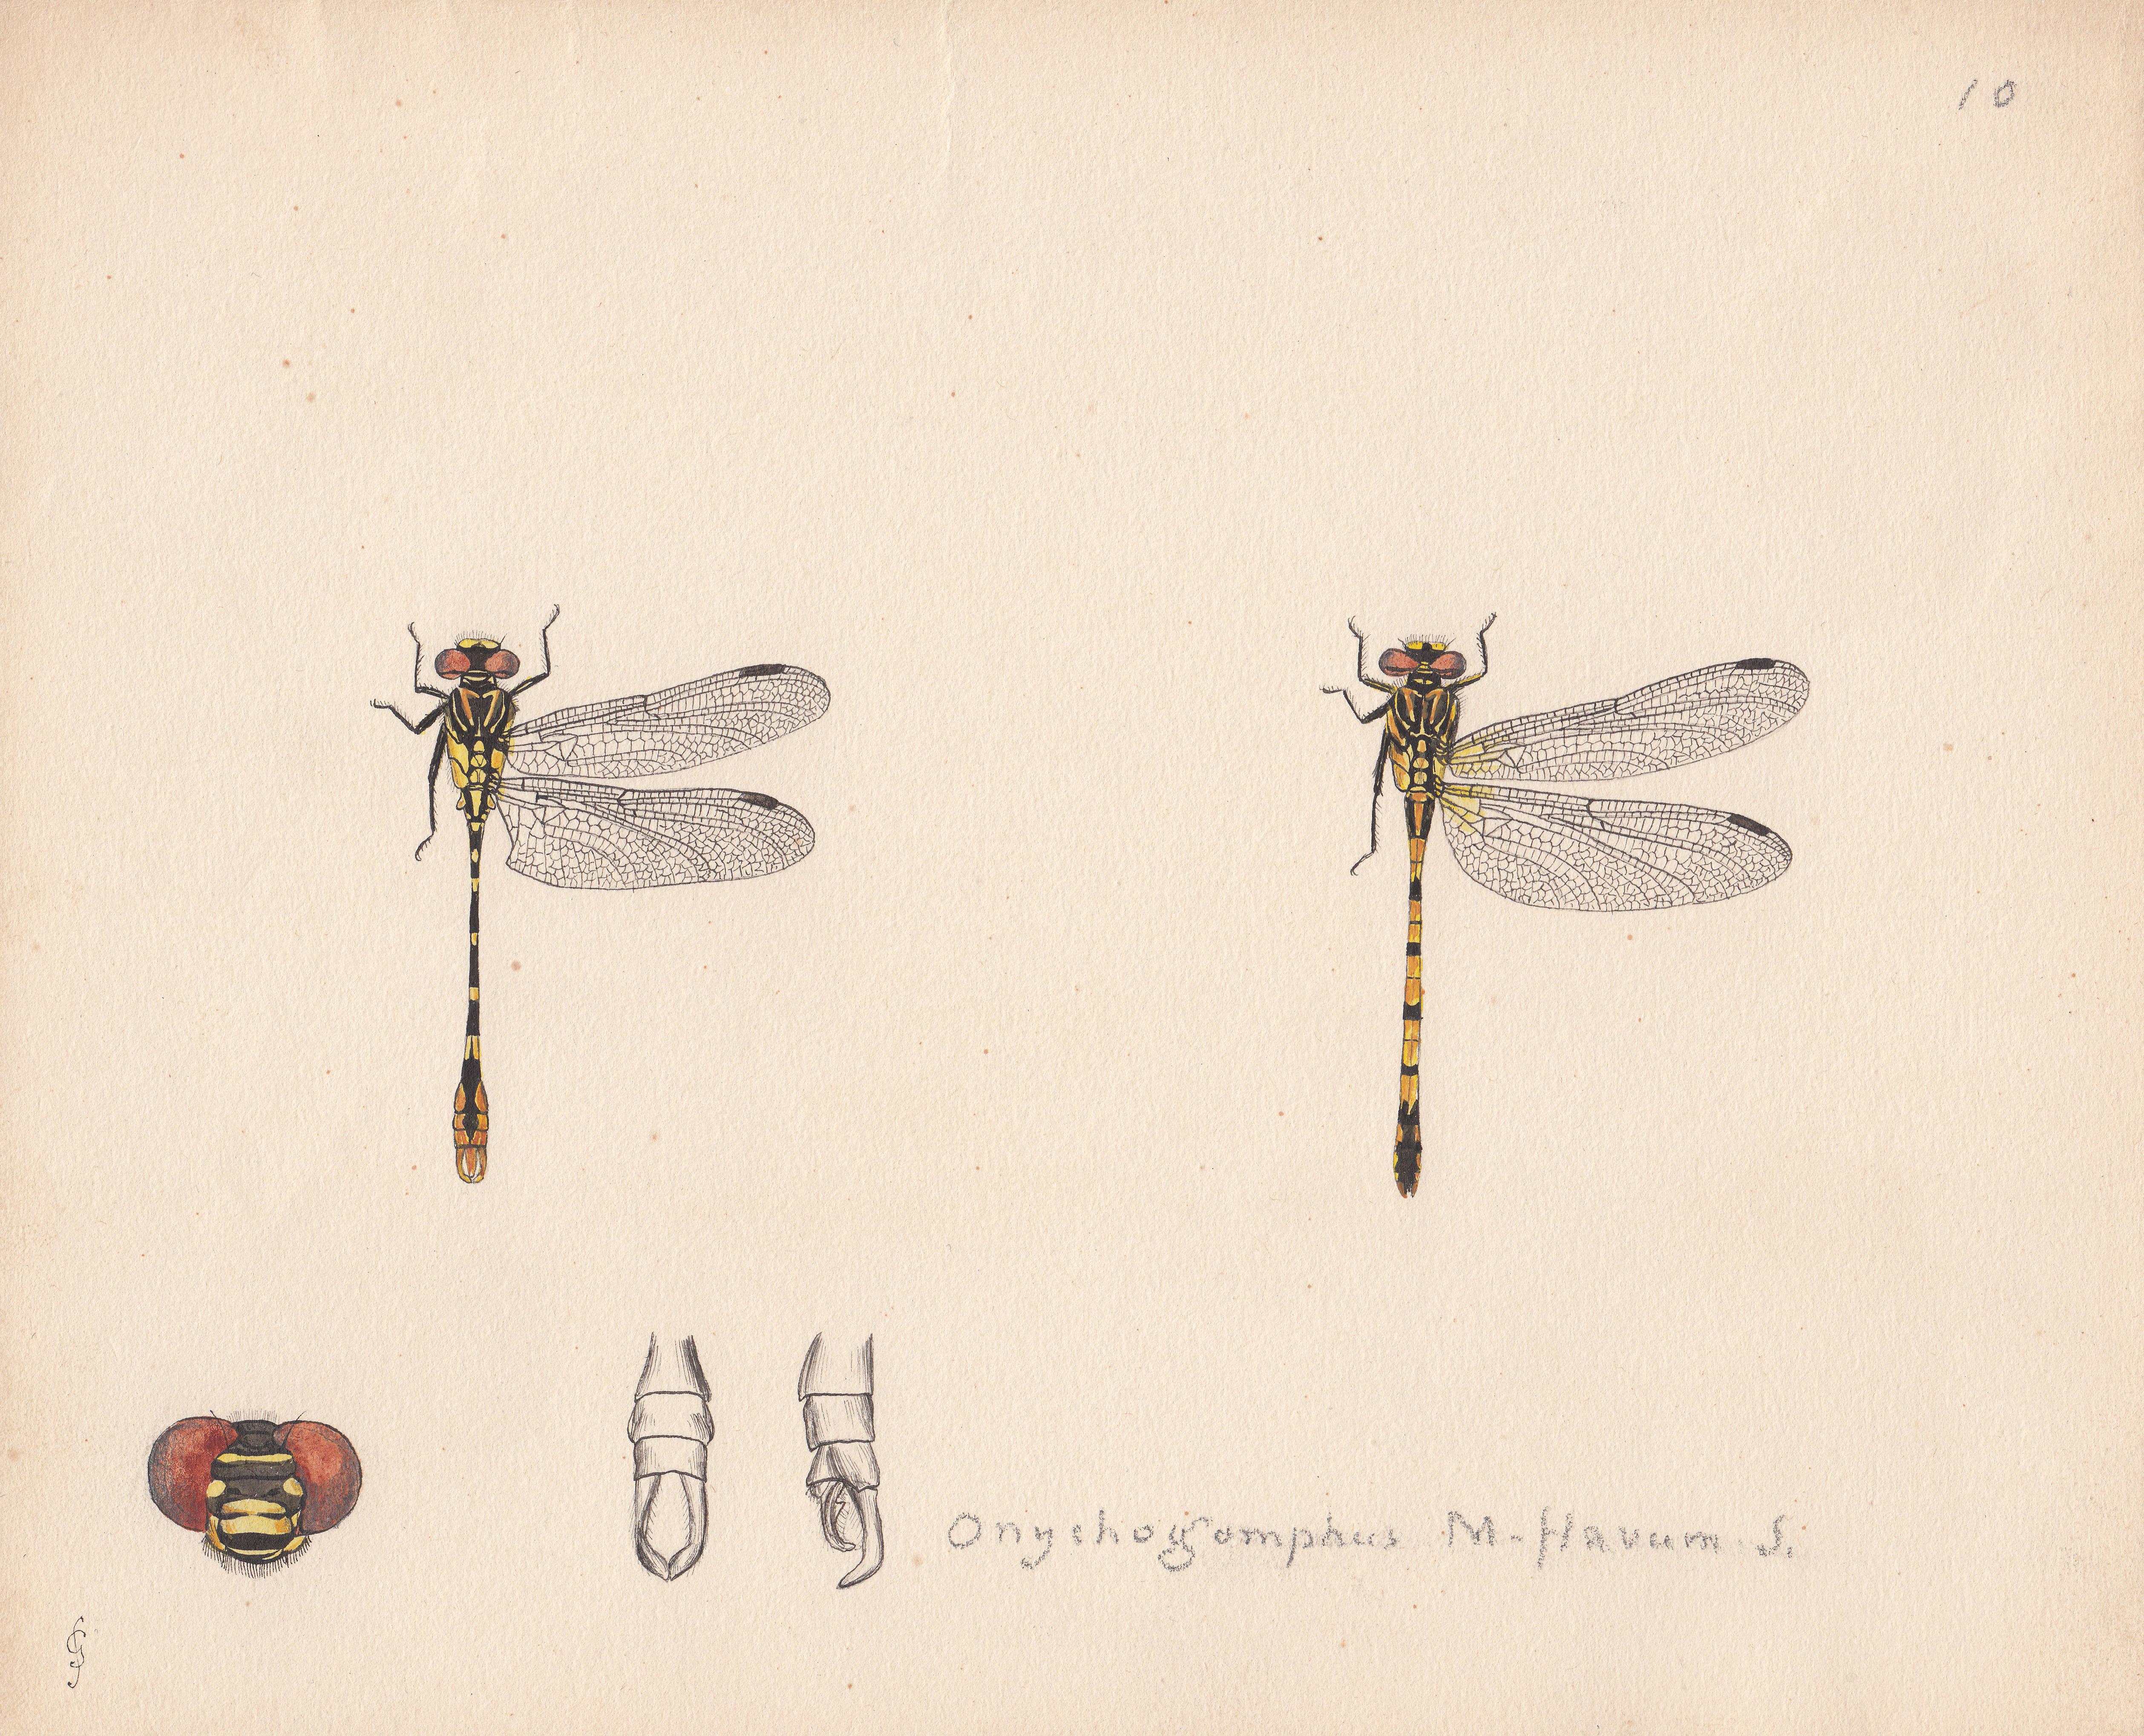 Onychogomphus m-flavum.jpg